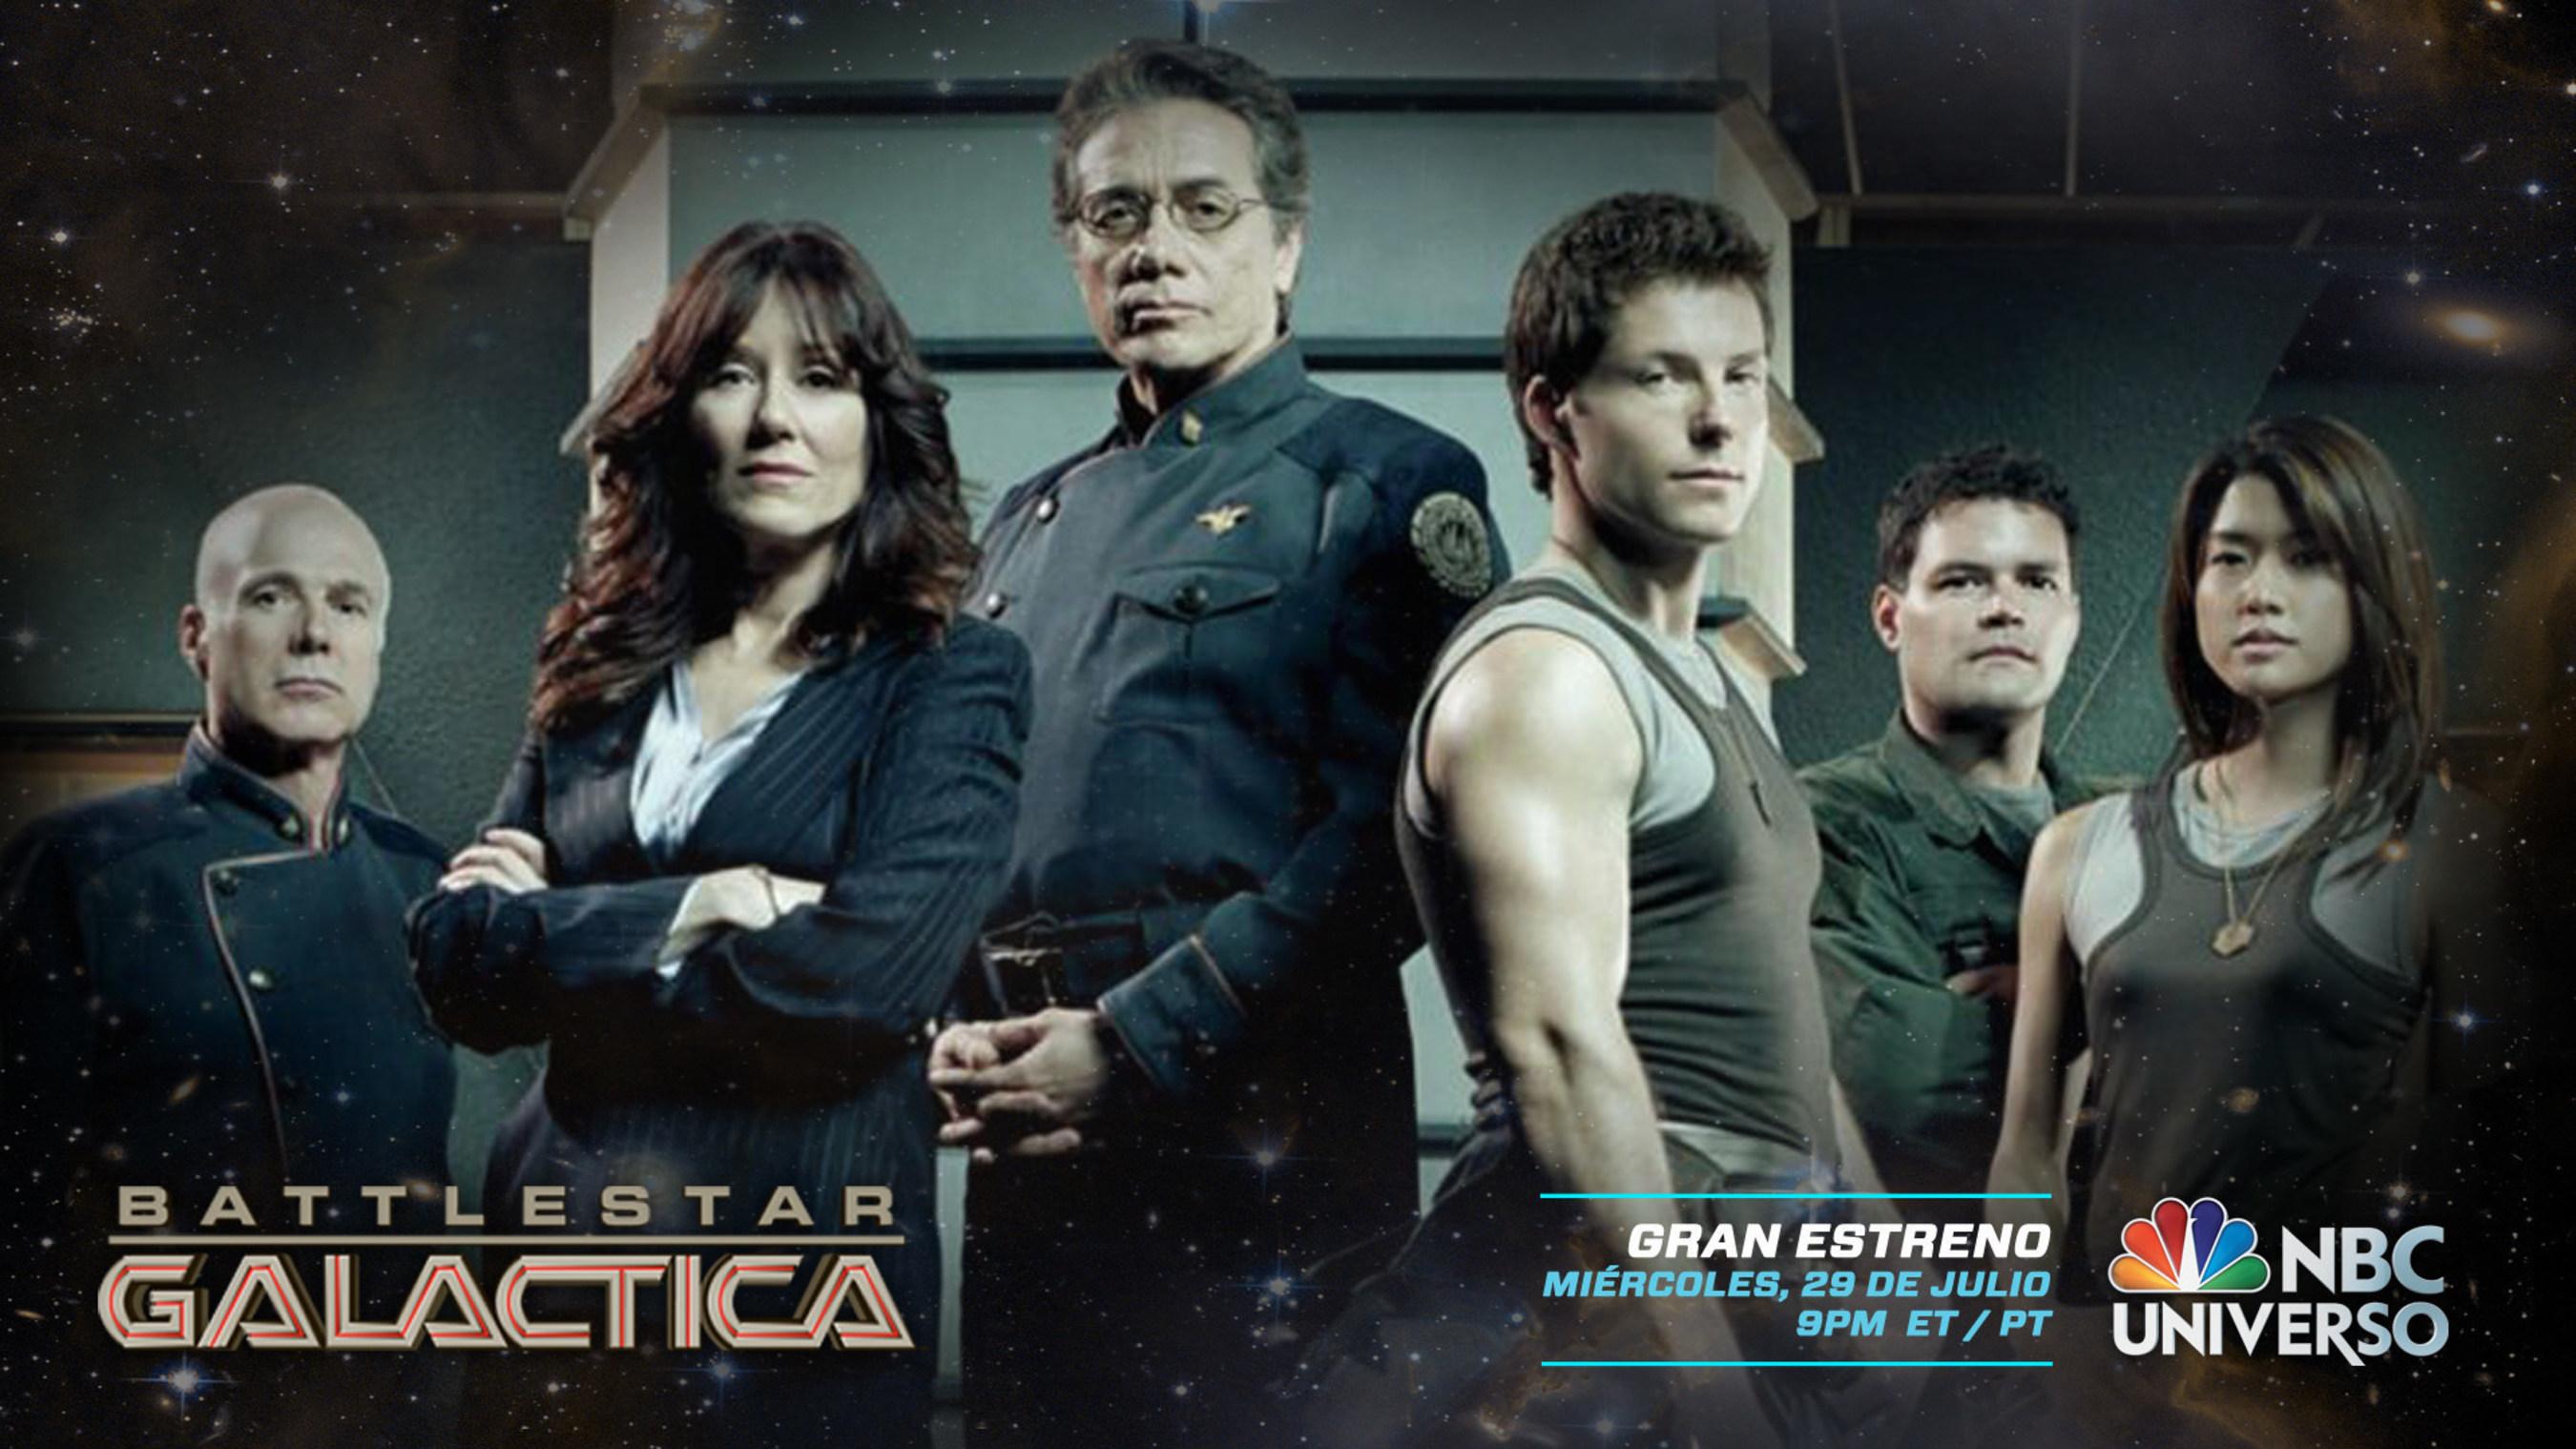 Battlestar Galactica on NBC UNIVERSO